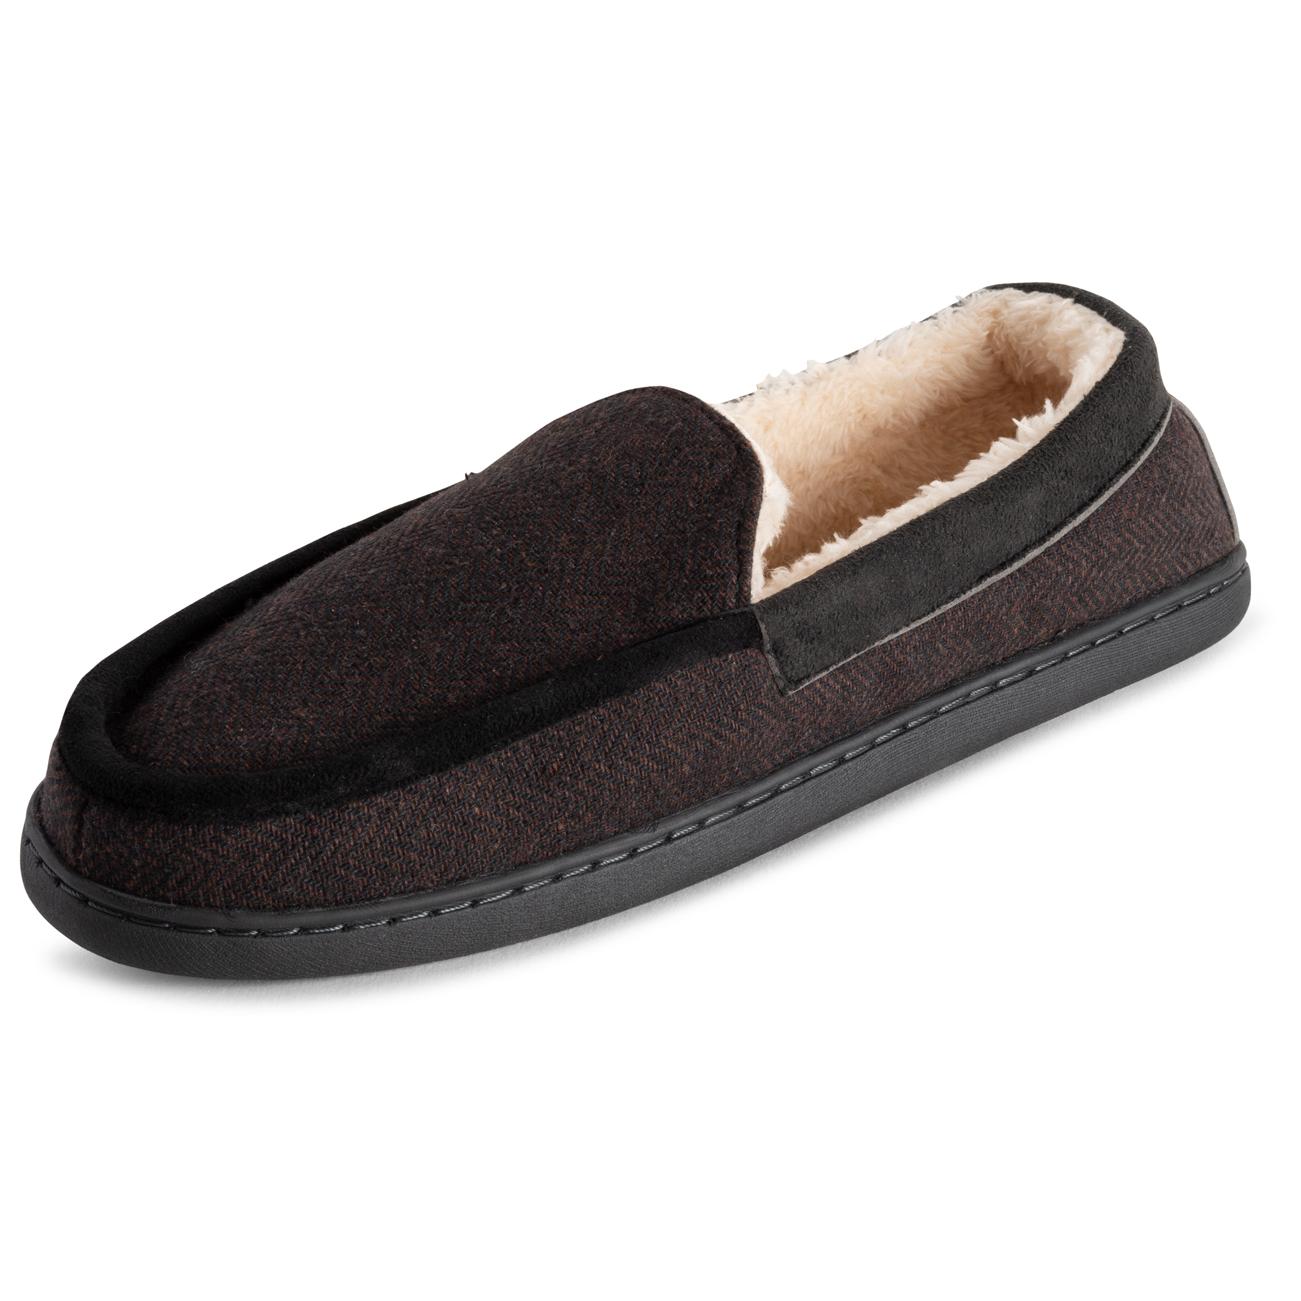 Womens Polar Memory Foam Comfort Faux Fur Moccasin Slippers Duel Size UK 3-10